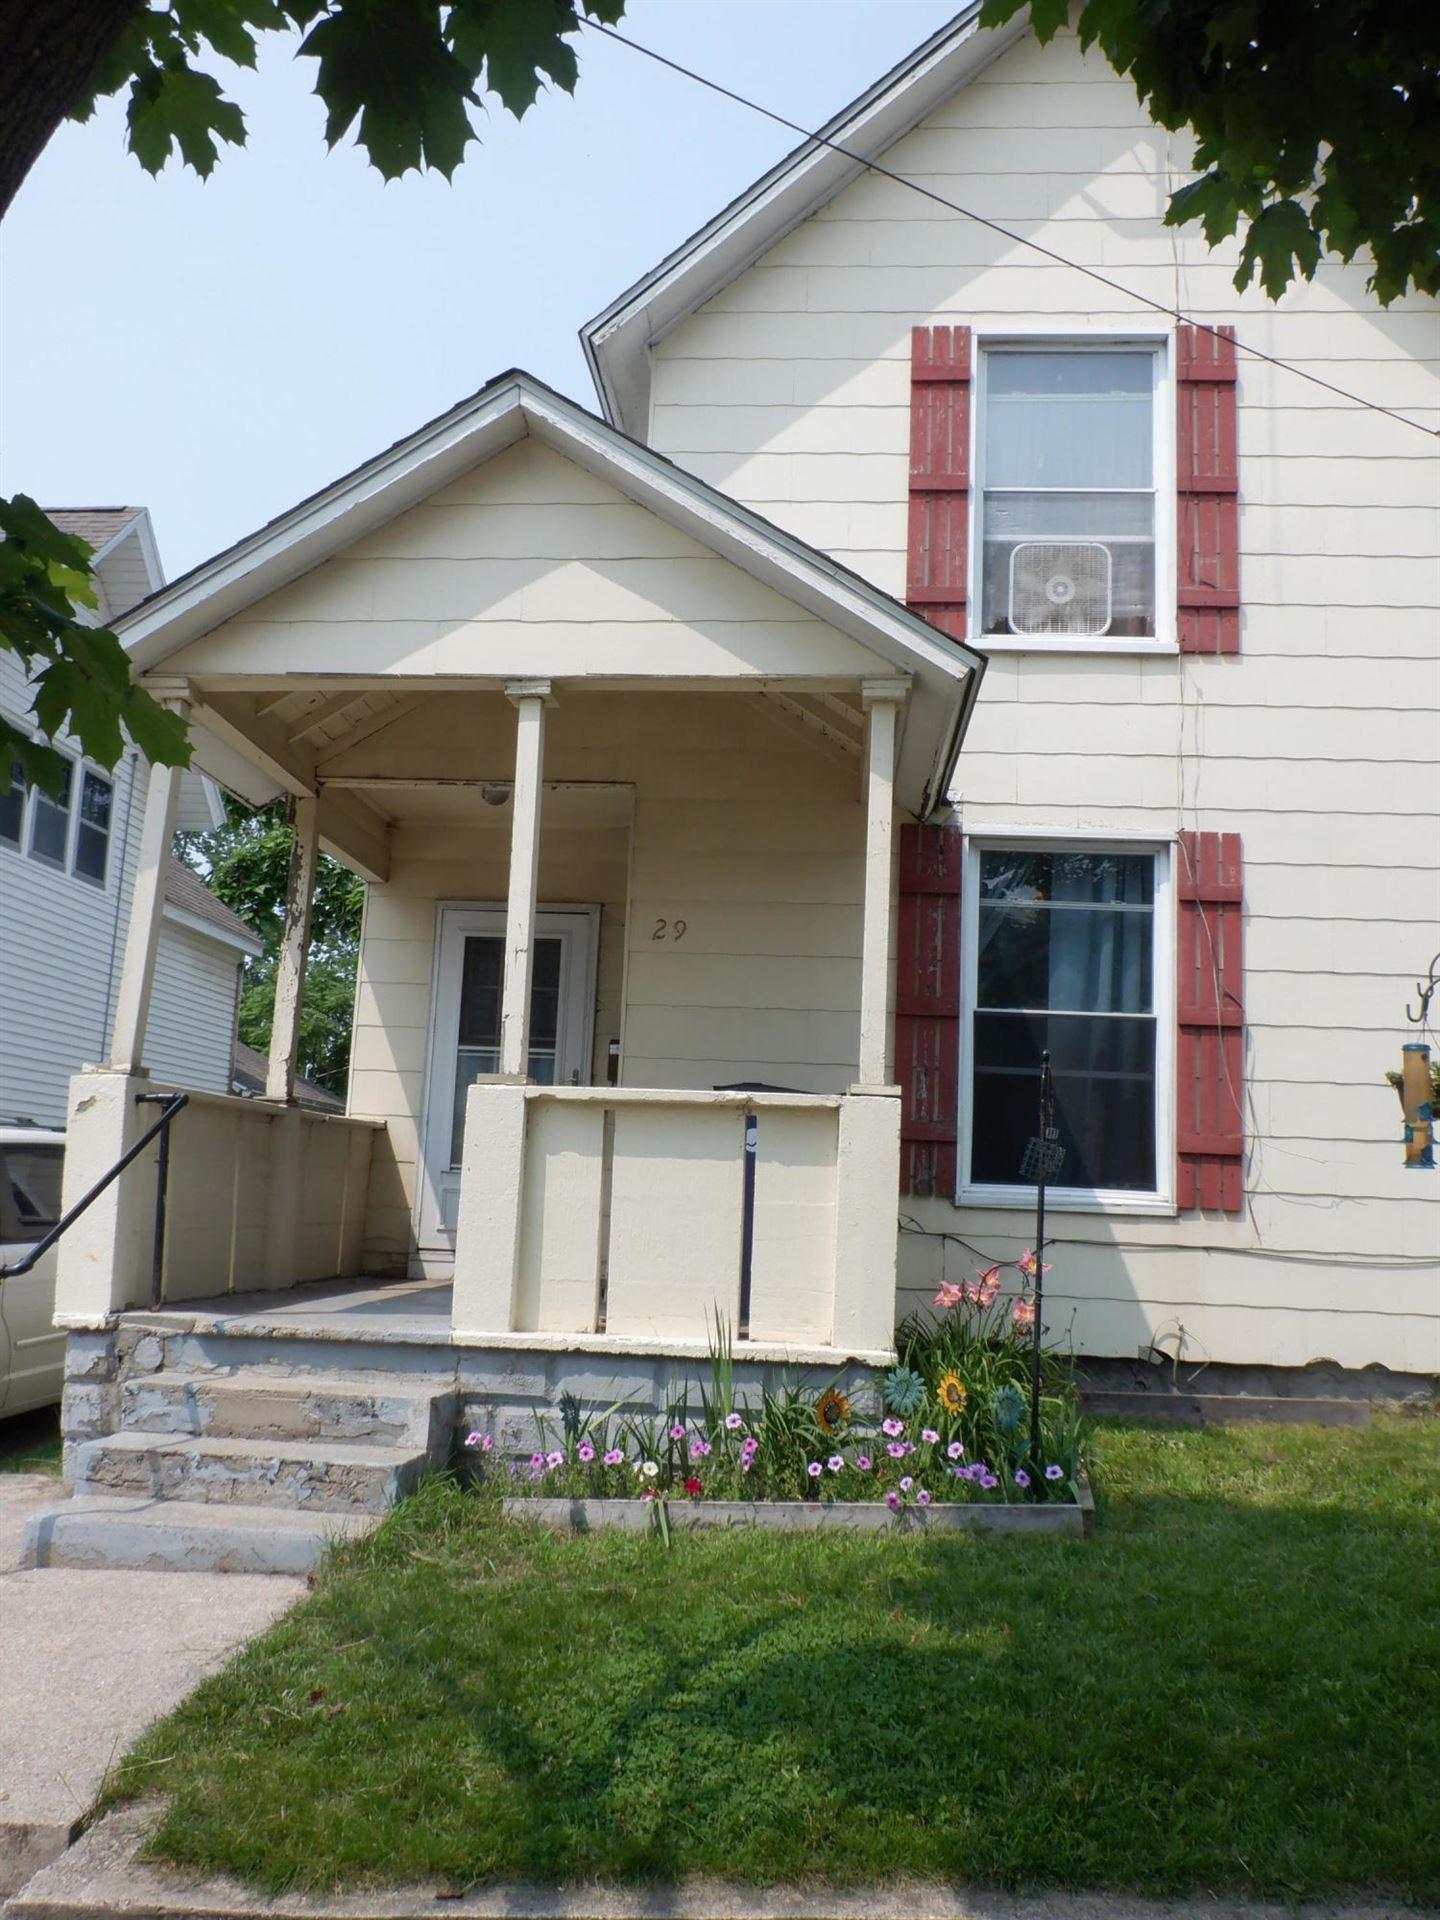 29 Grove Street Street NE, Grand Rapids, MI 49505 - MLS#: 21033977